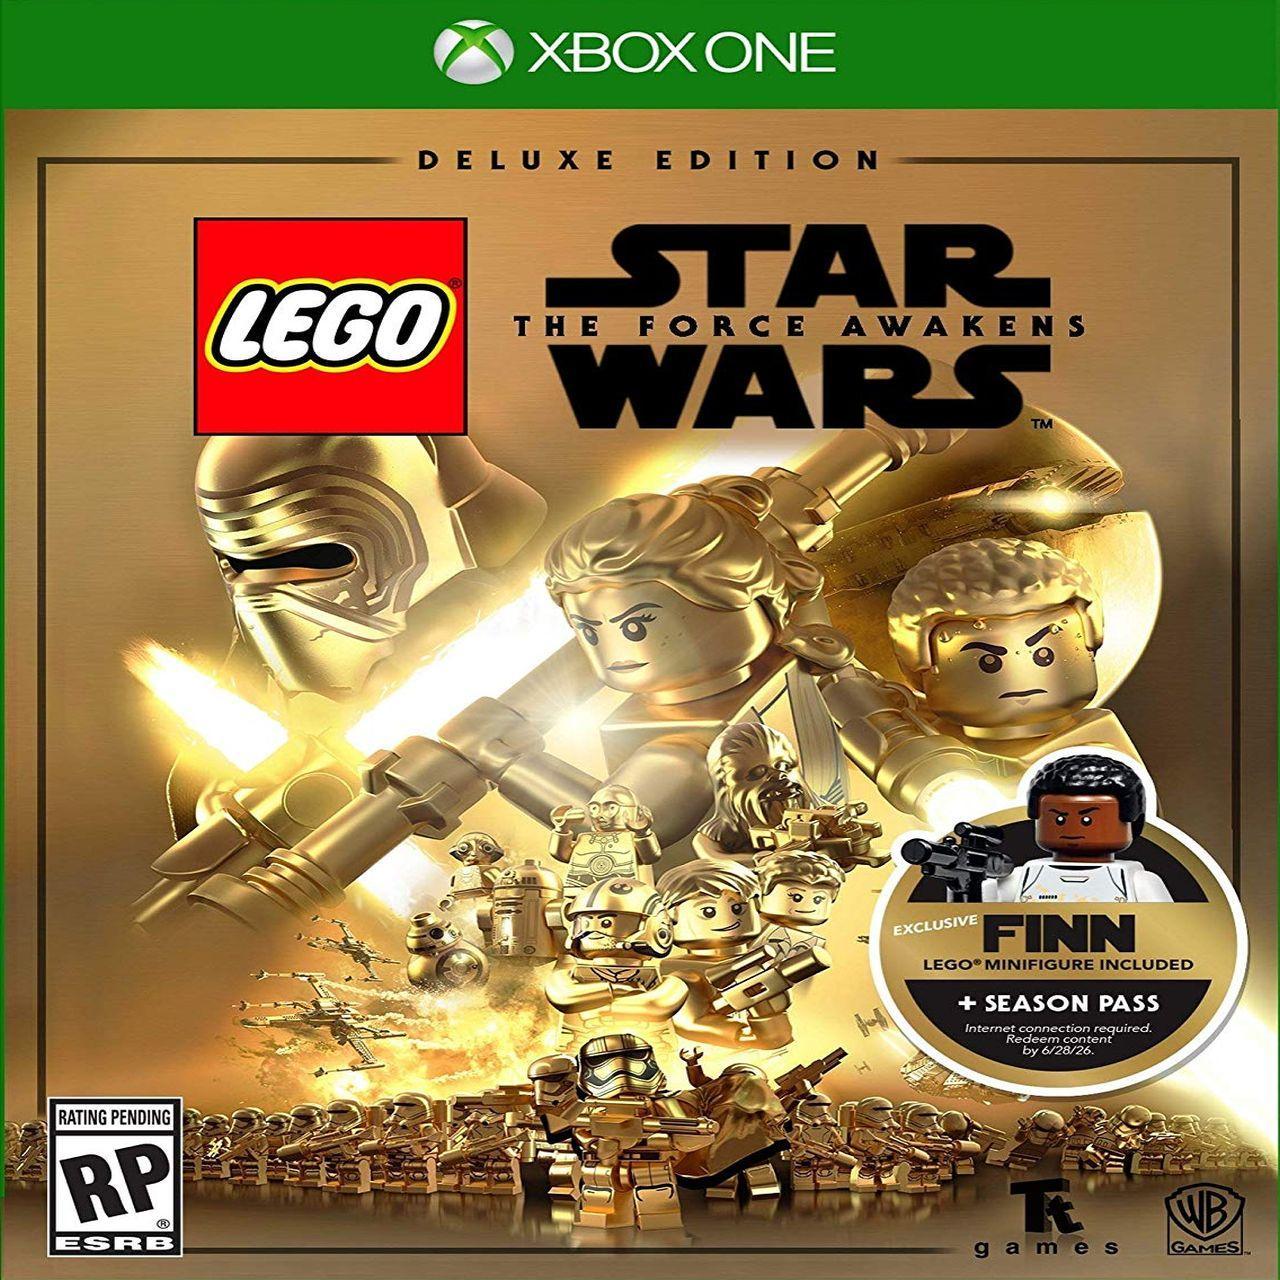 Lego Star Wars The Force Awakens Deluxe Edition (російські субтитри) XBOX ONE